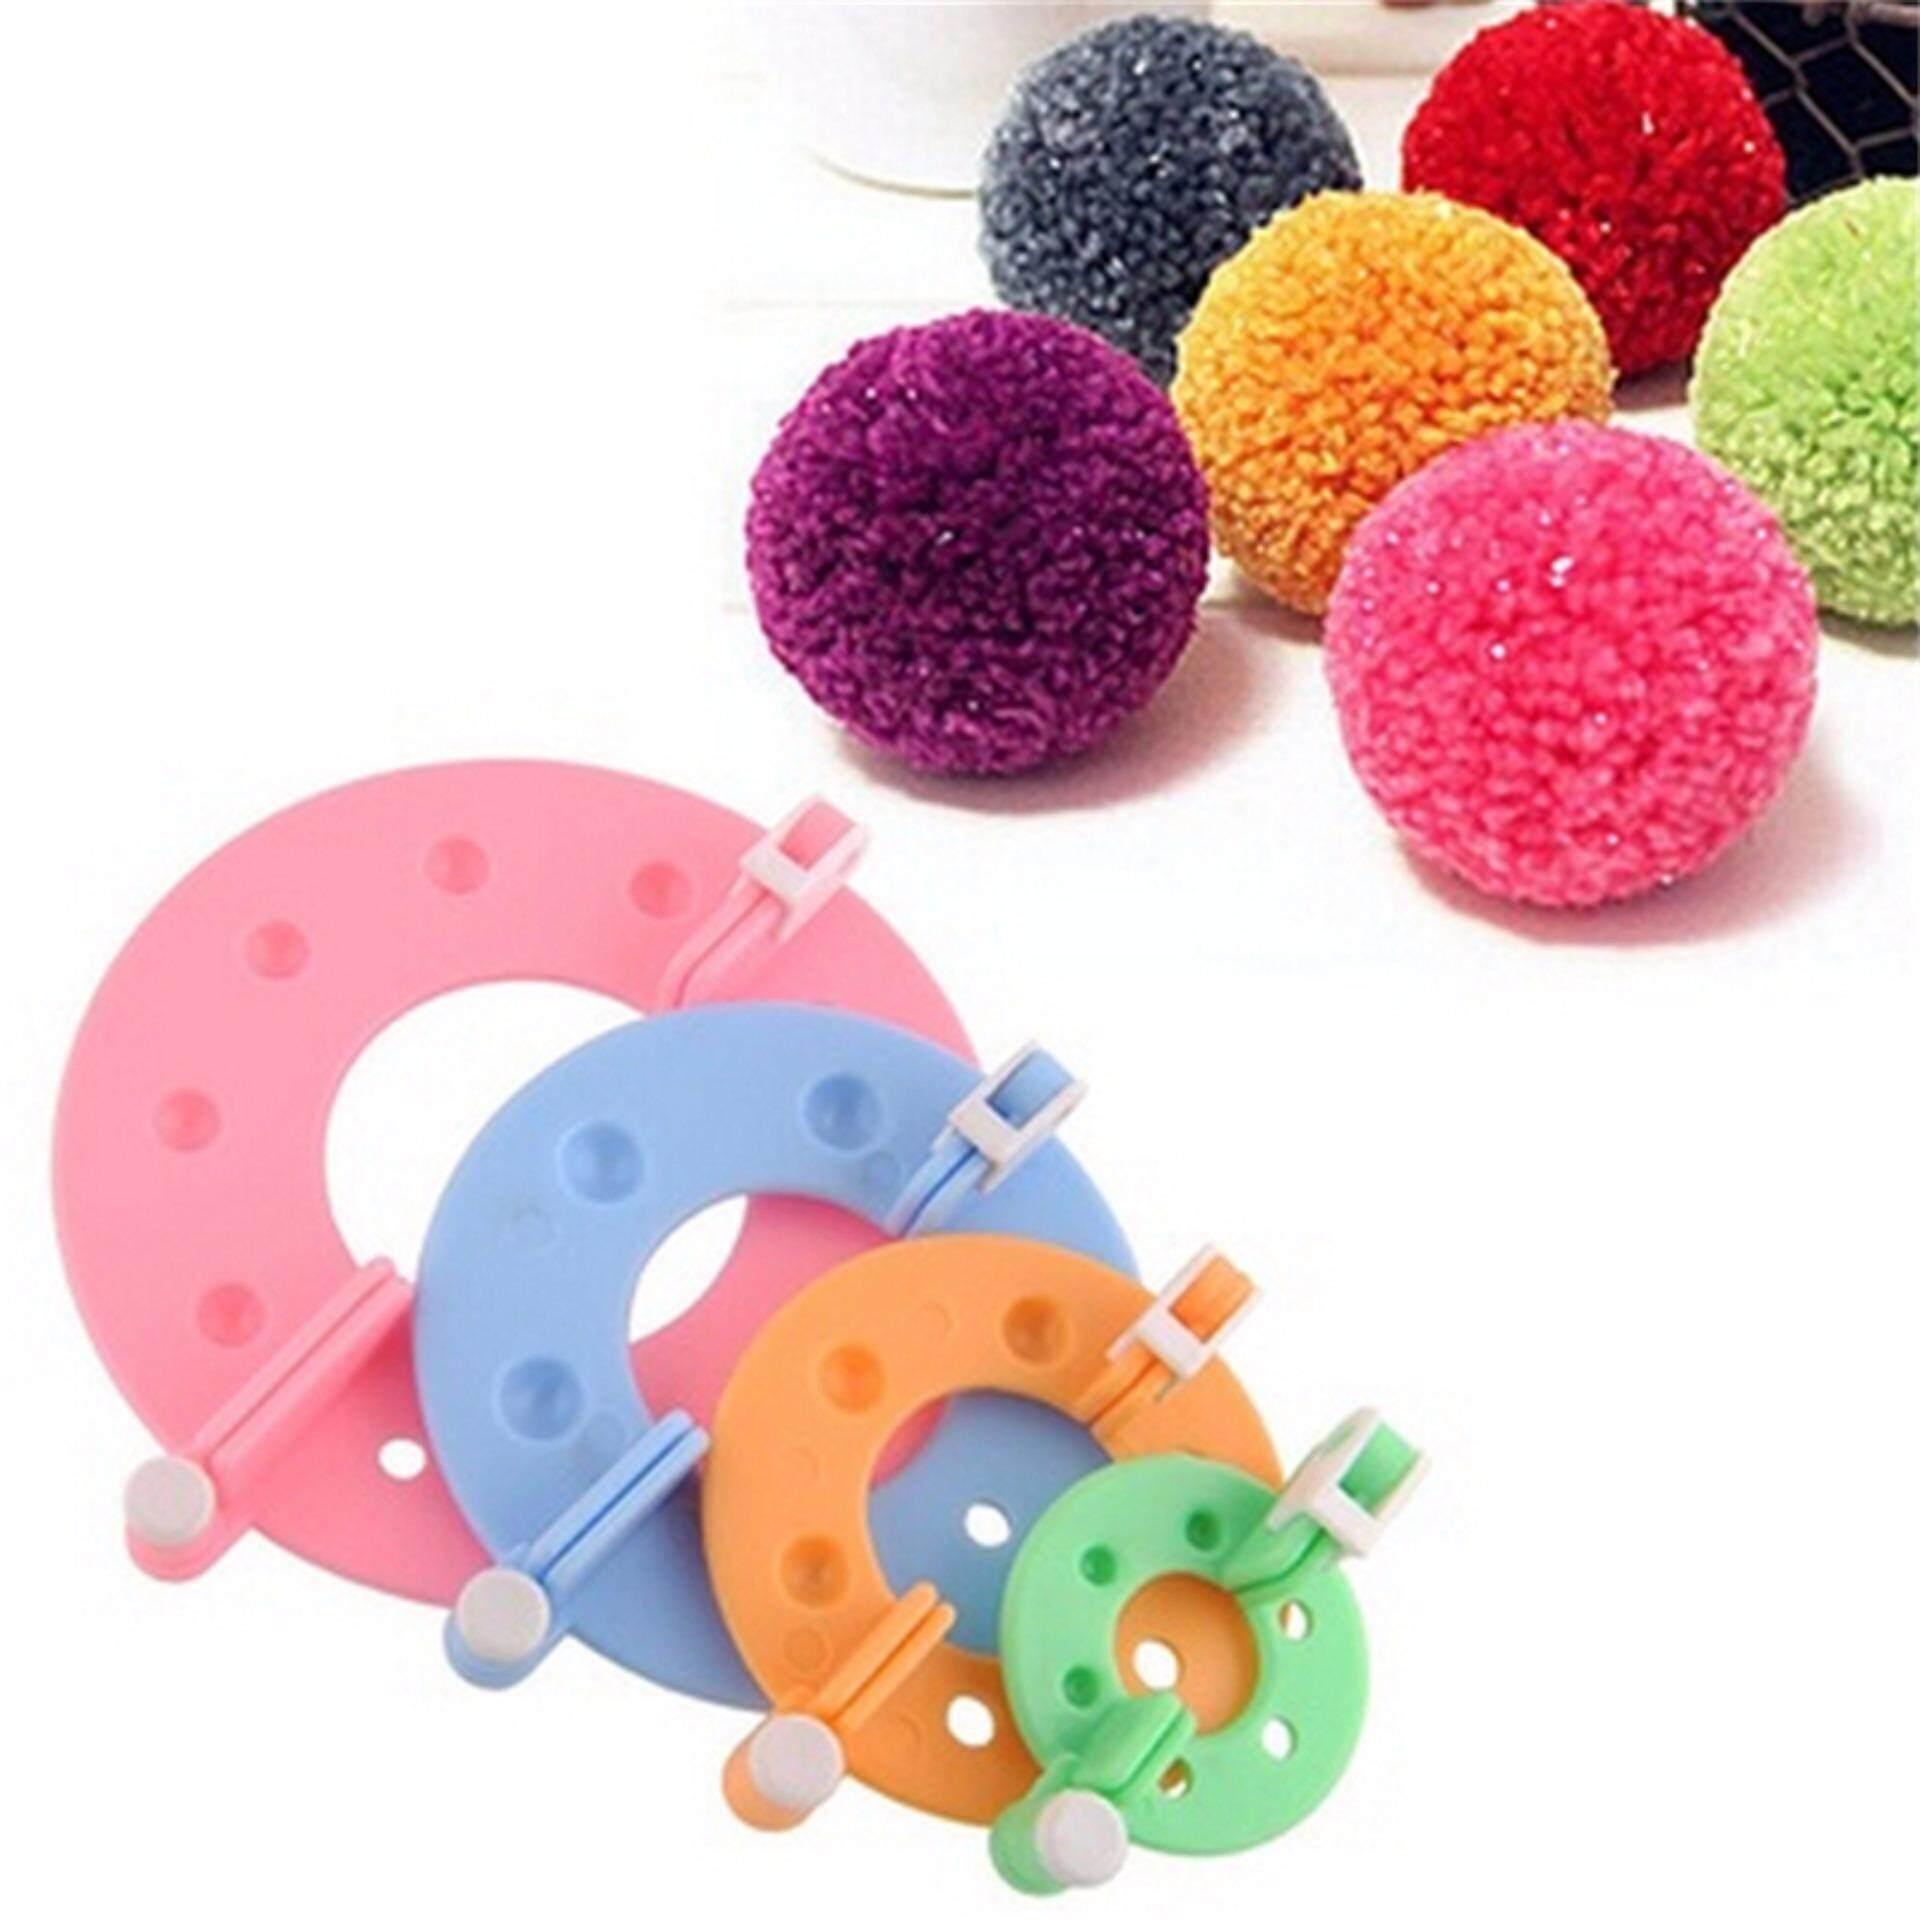 8pc DIY Fluff Ball Weaver Needle Craft Knitting Loom Essential Pompom Maker Tool Multicolor - intl